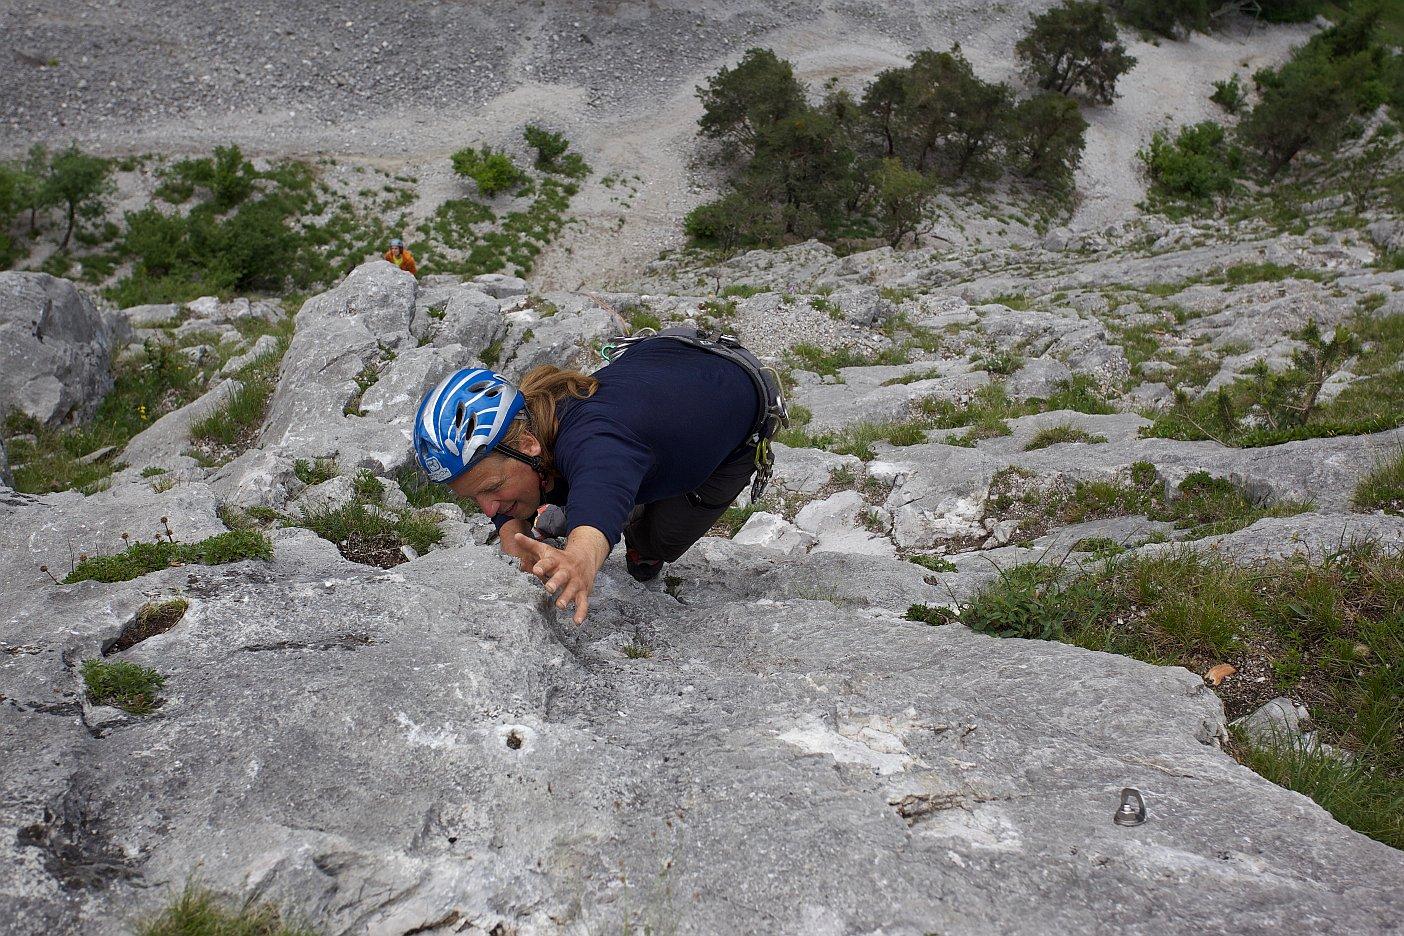 Andy Holzer im Vorstieg, Climbers Paradise